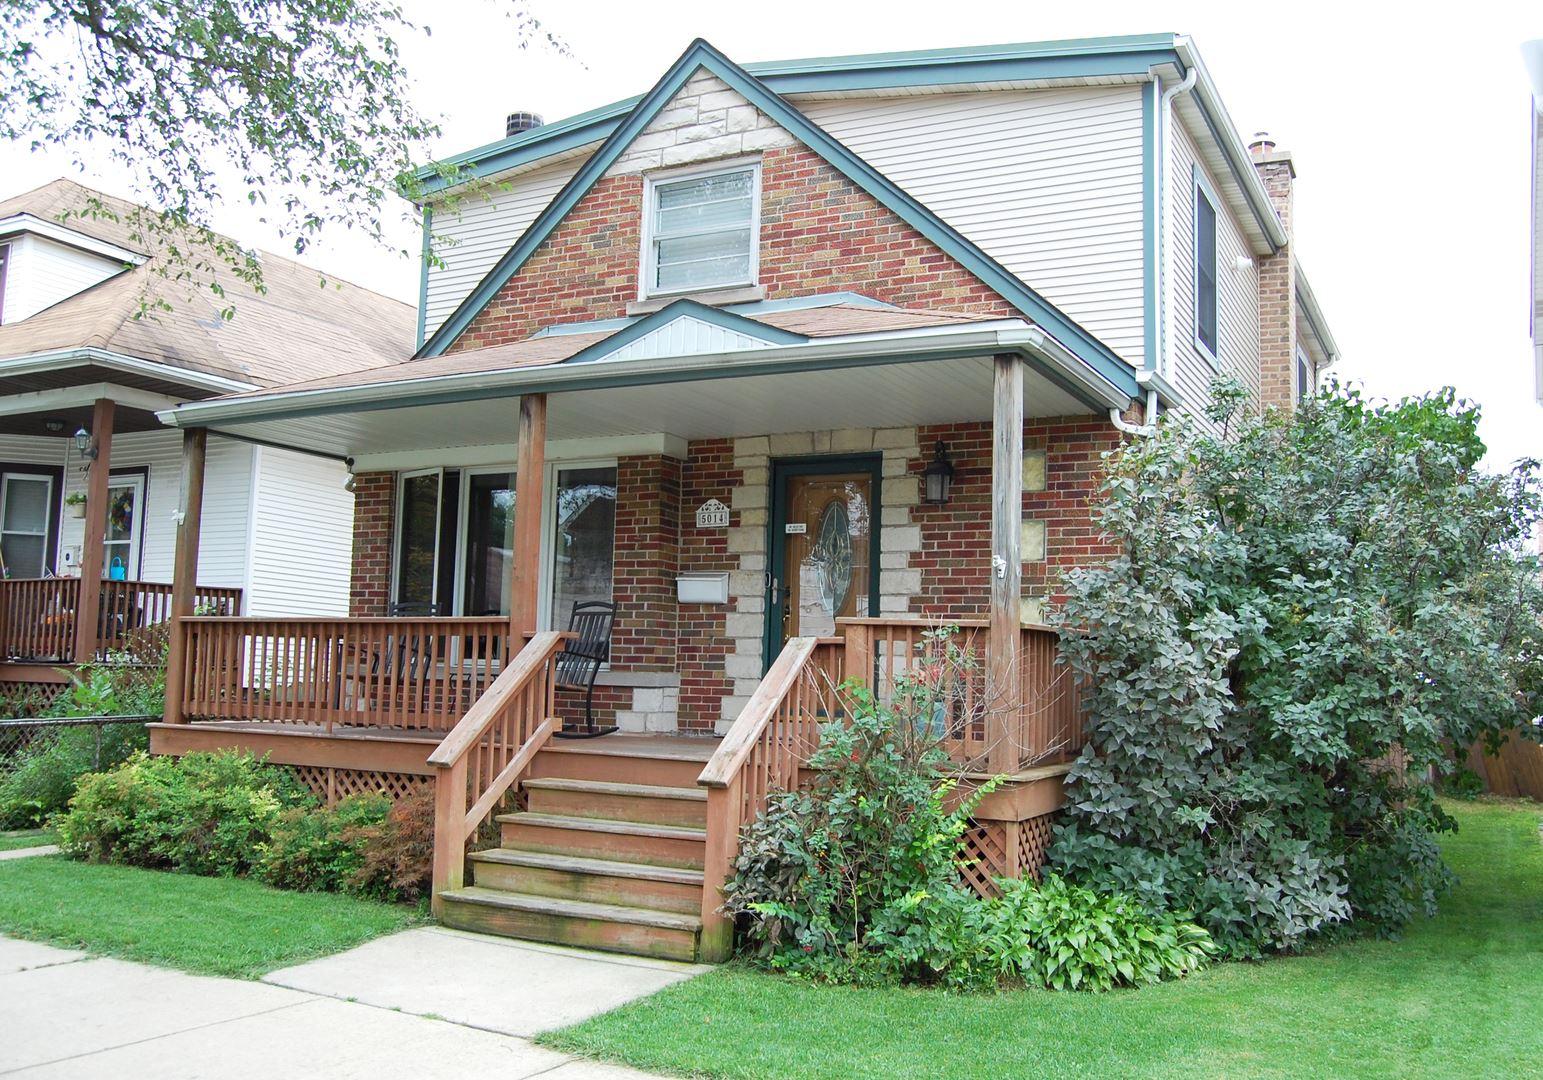 5014 N Meade Avenue, Chicago, IL 60630 - #: 10714905